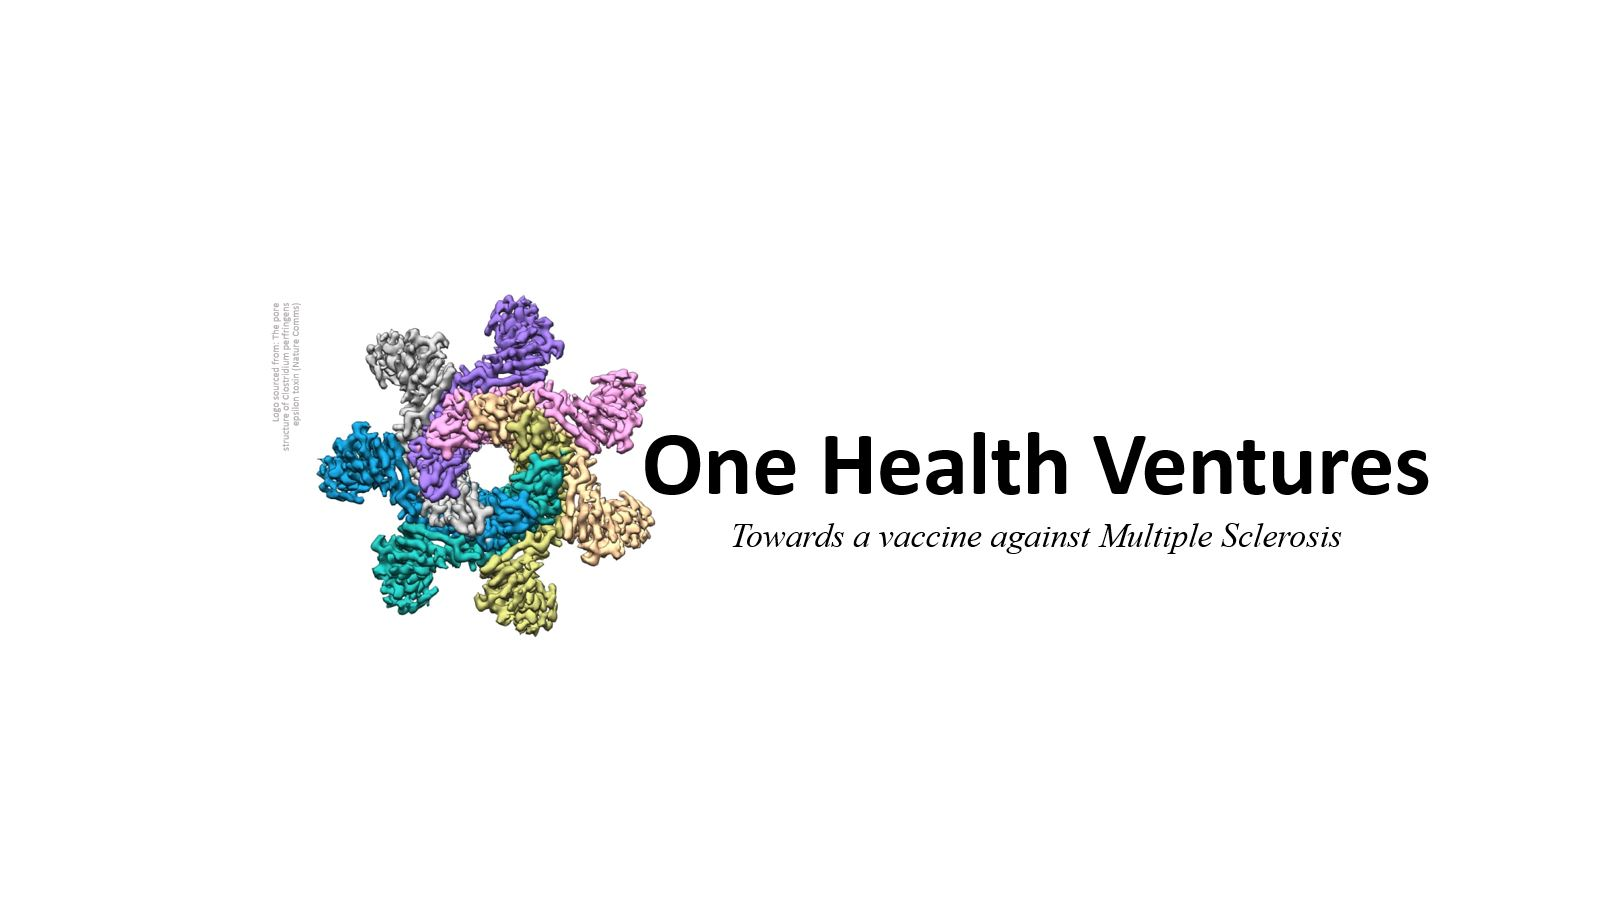 One Health Ventures